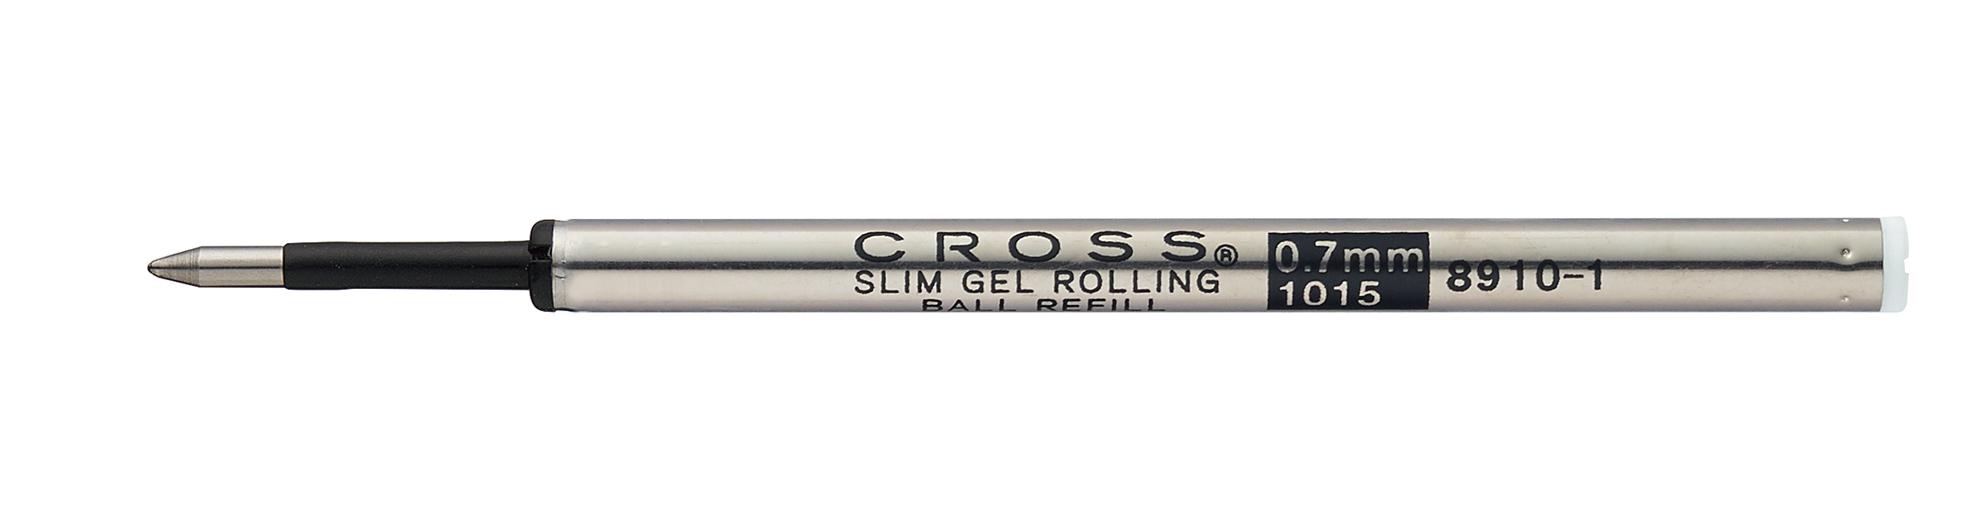 Slim Gel Rollerball Pen Refill - Black - Single Pack